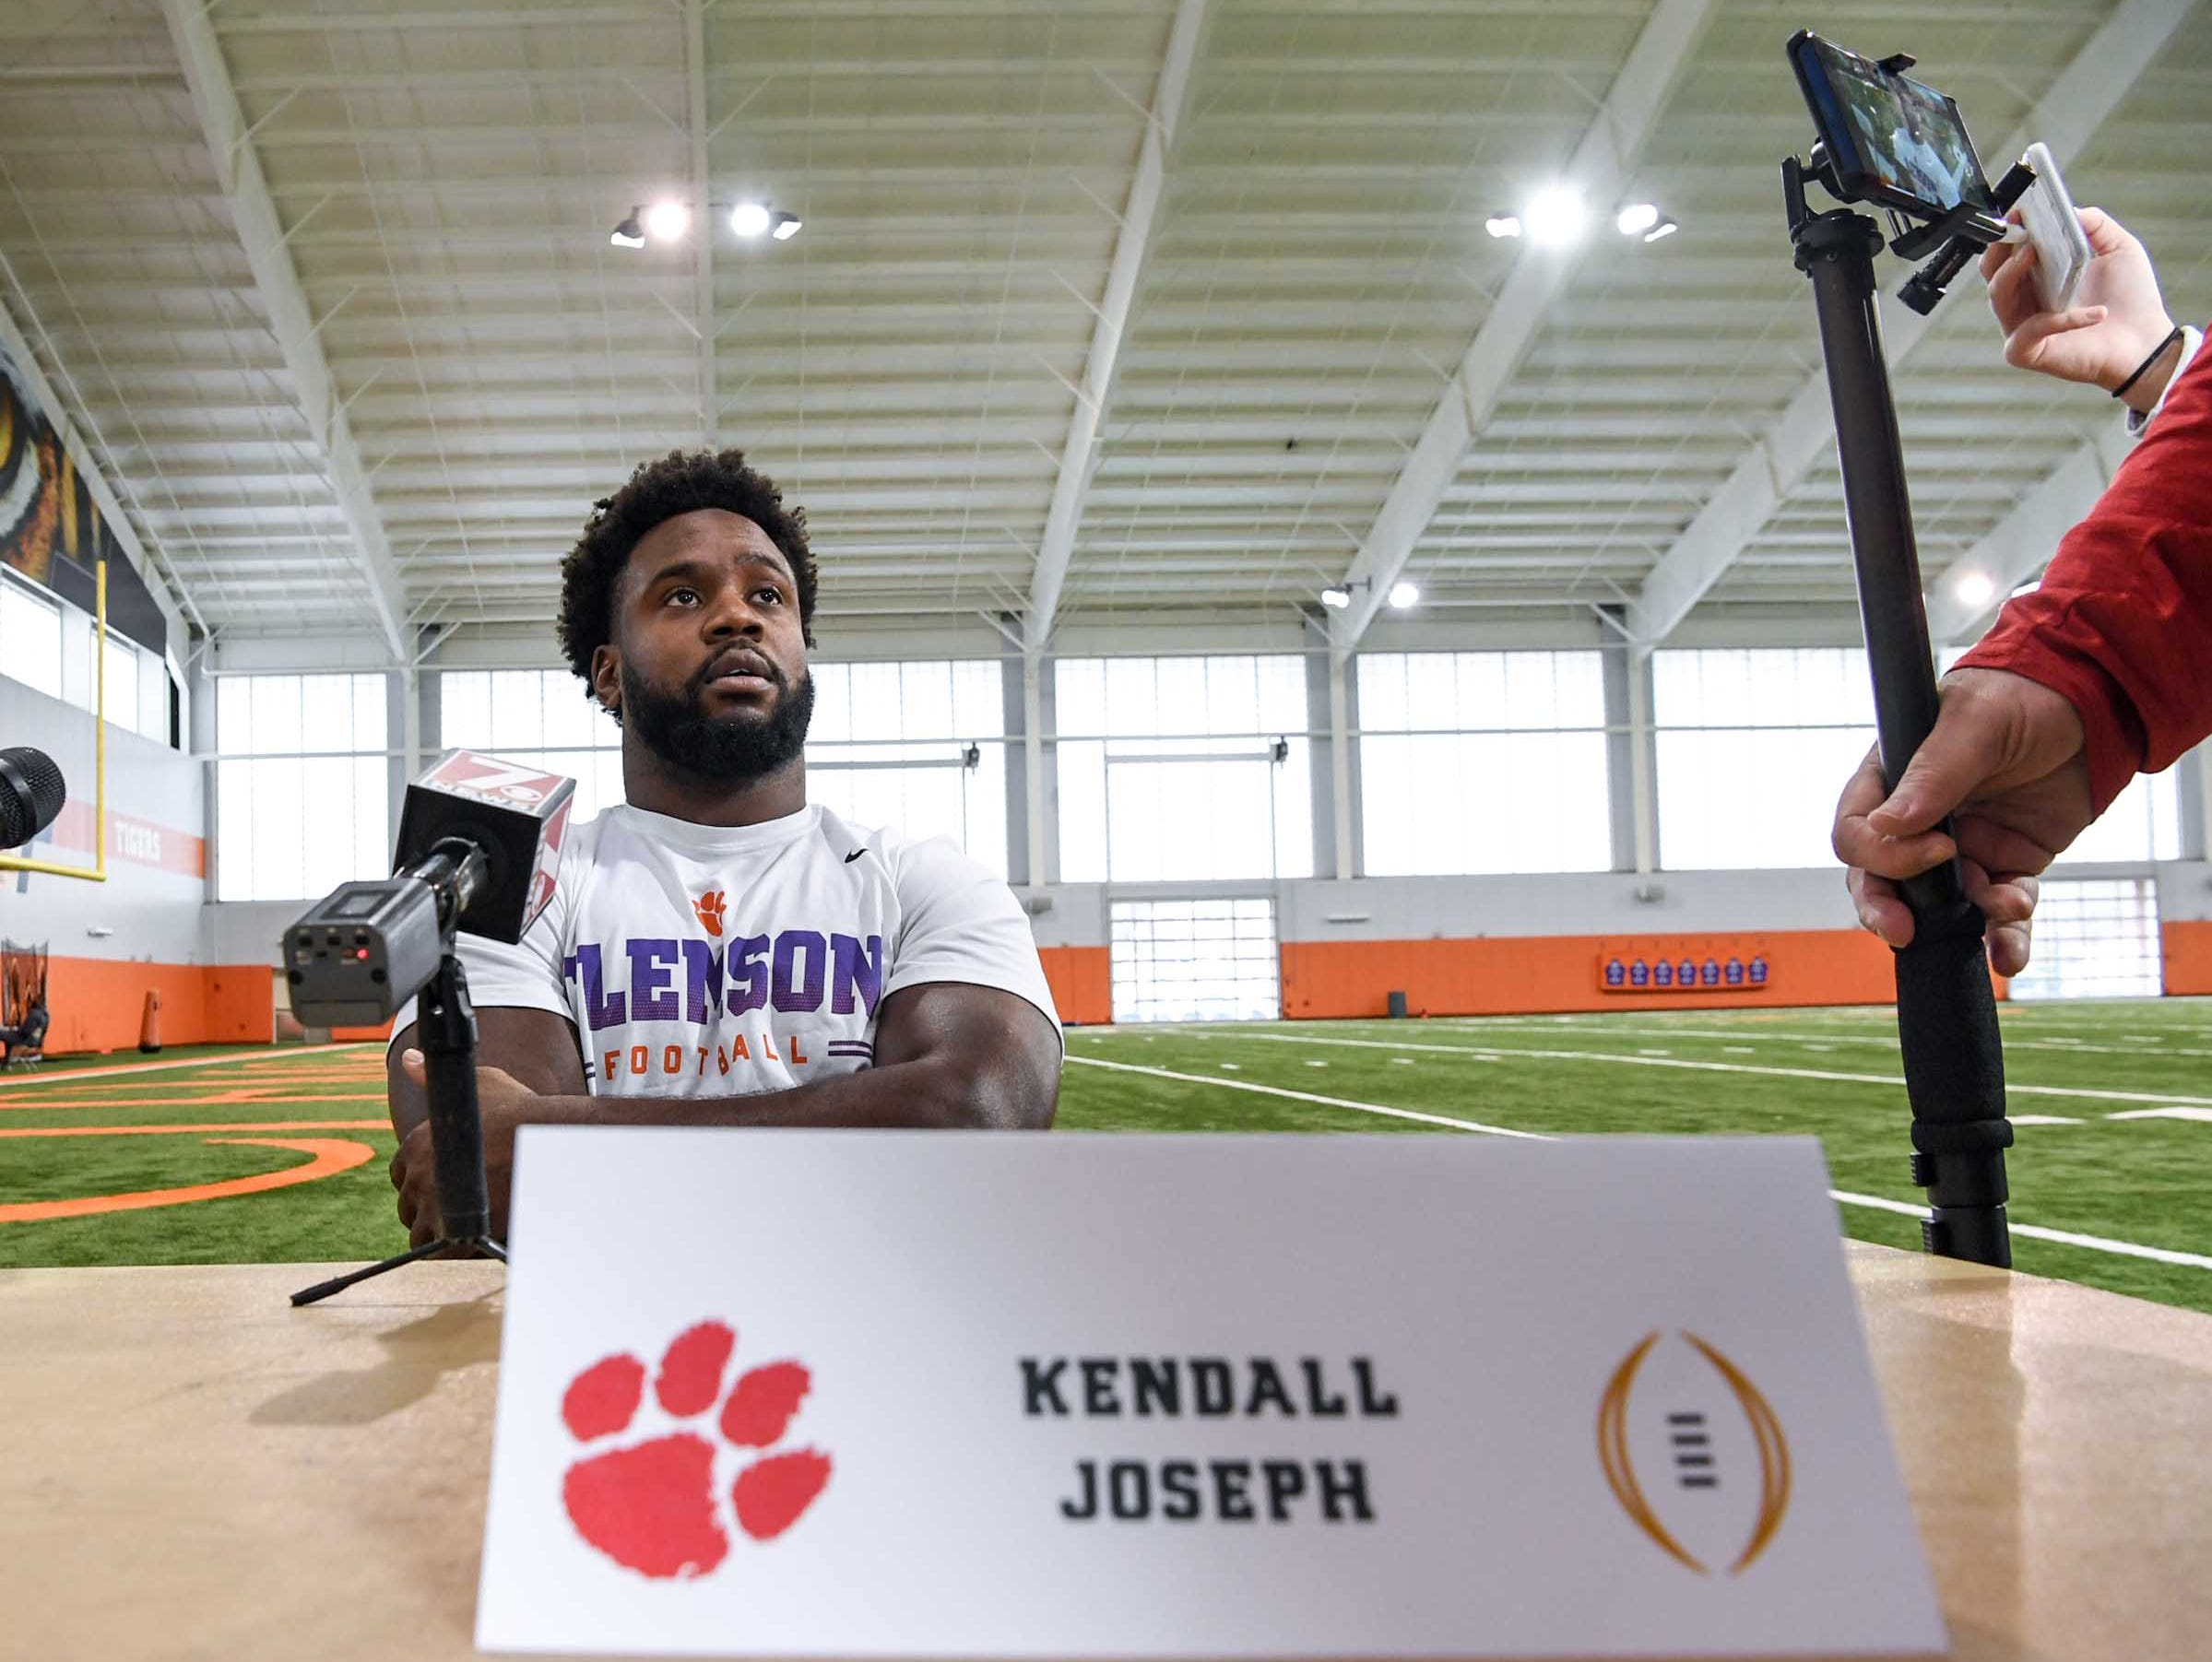 Clemson linebacker Kendall Joseph speaks during media day in the Poe Indoor Facility in Clemson Wednesday, January 2, 2019.